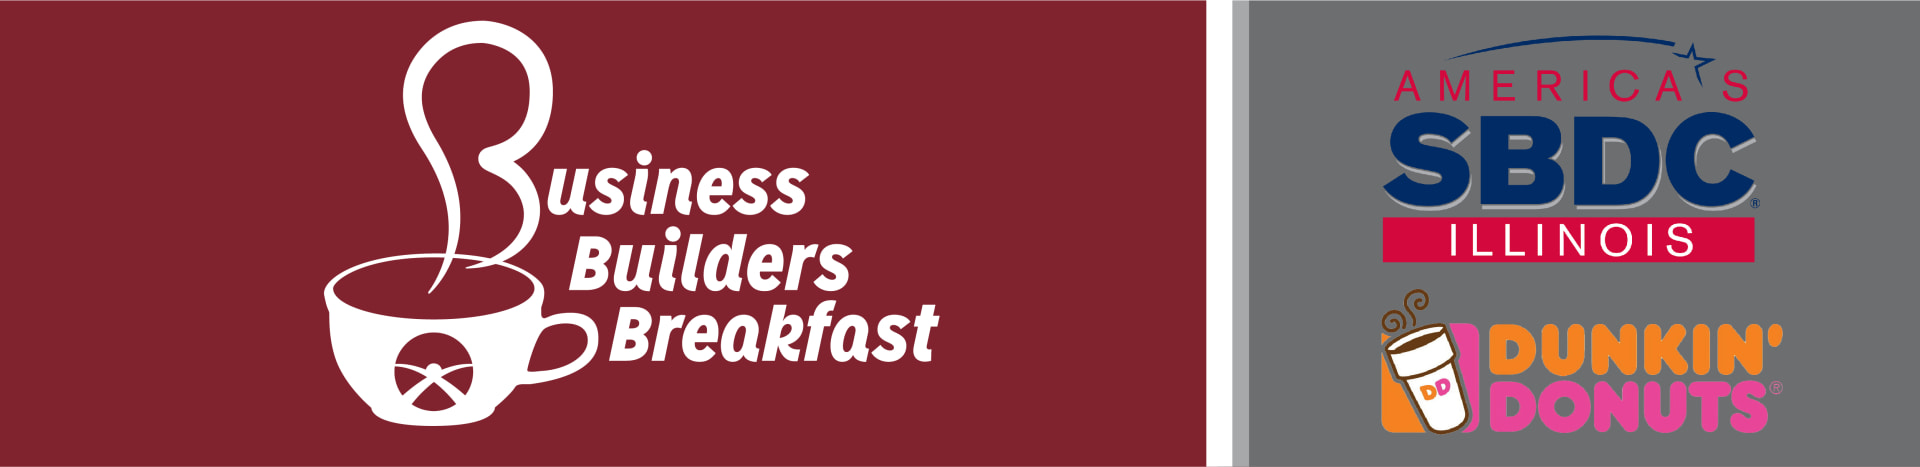 Business Builders Breakfast